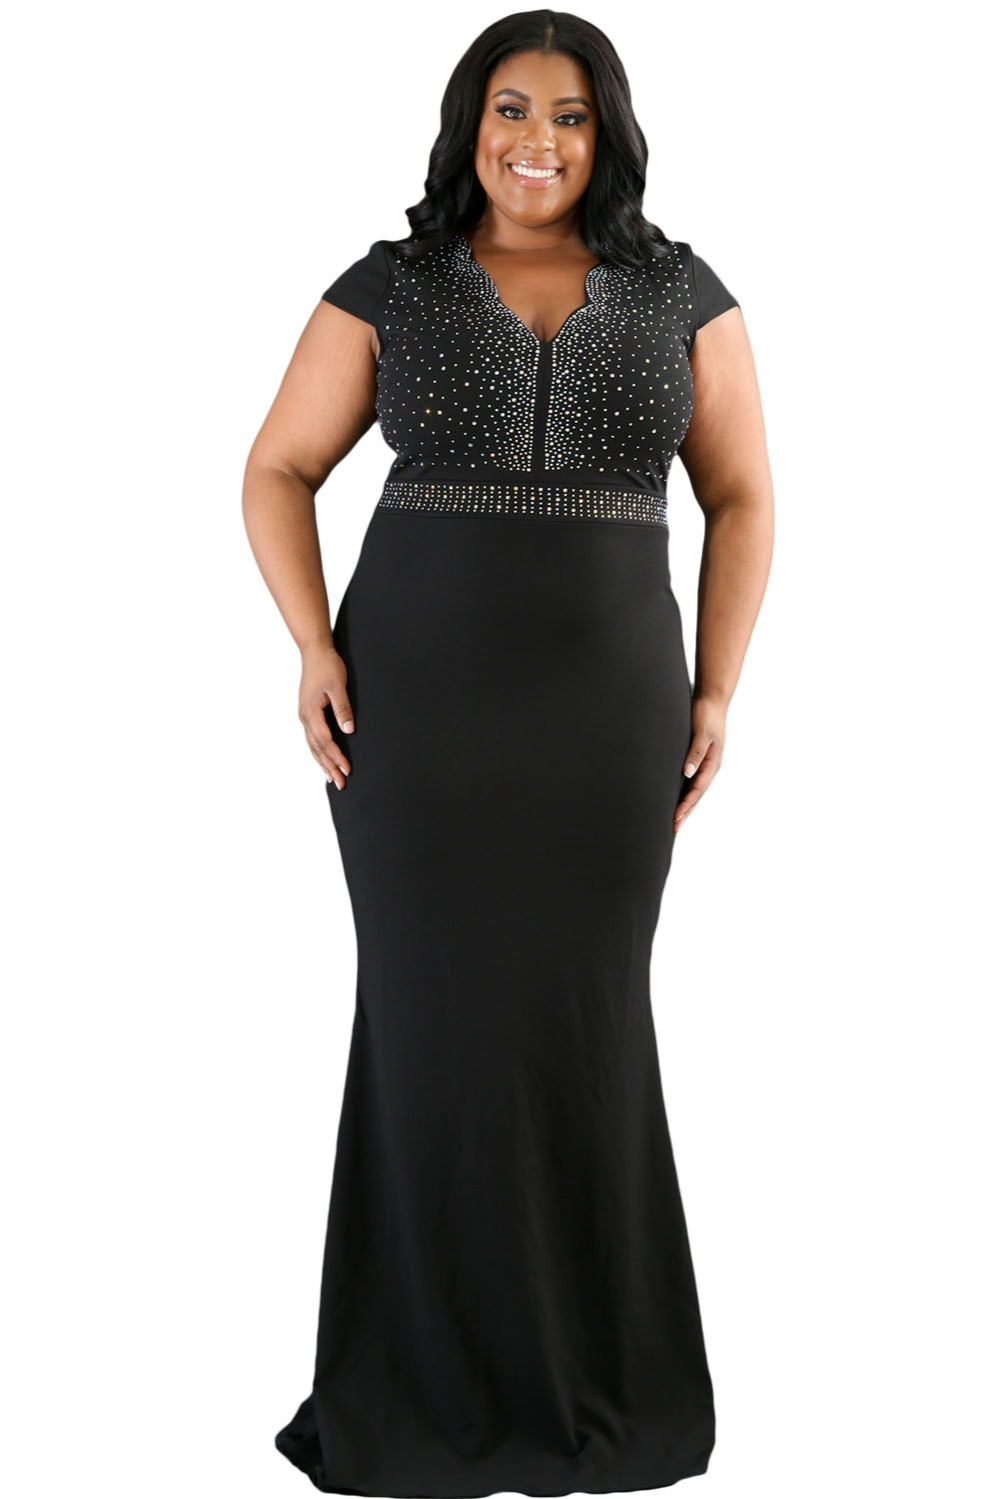 Plus Size Dresses For Wedding Black